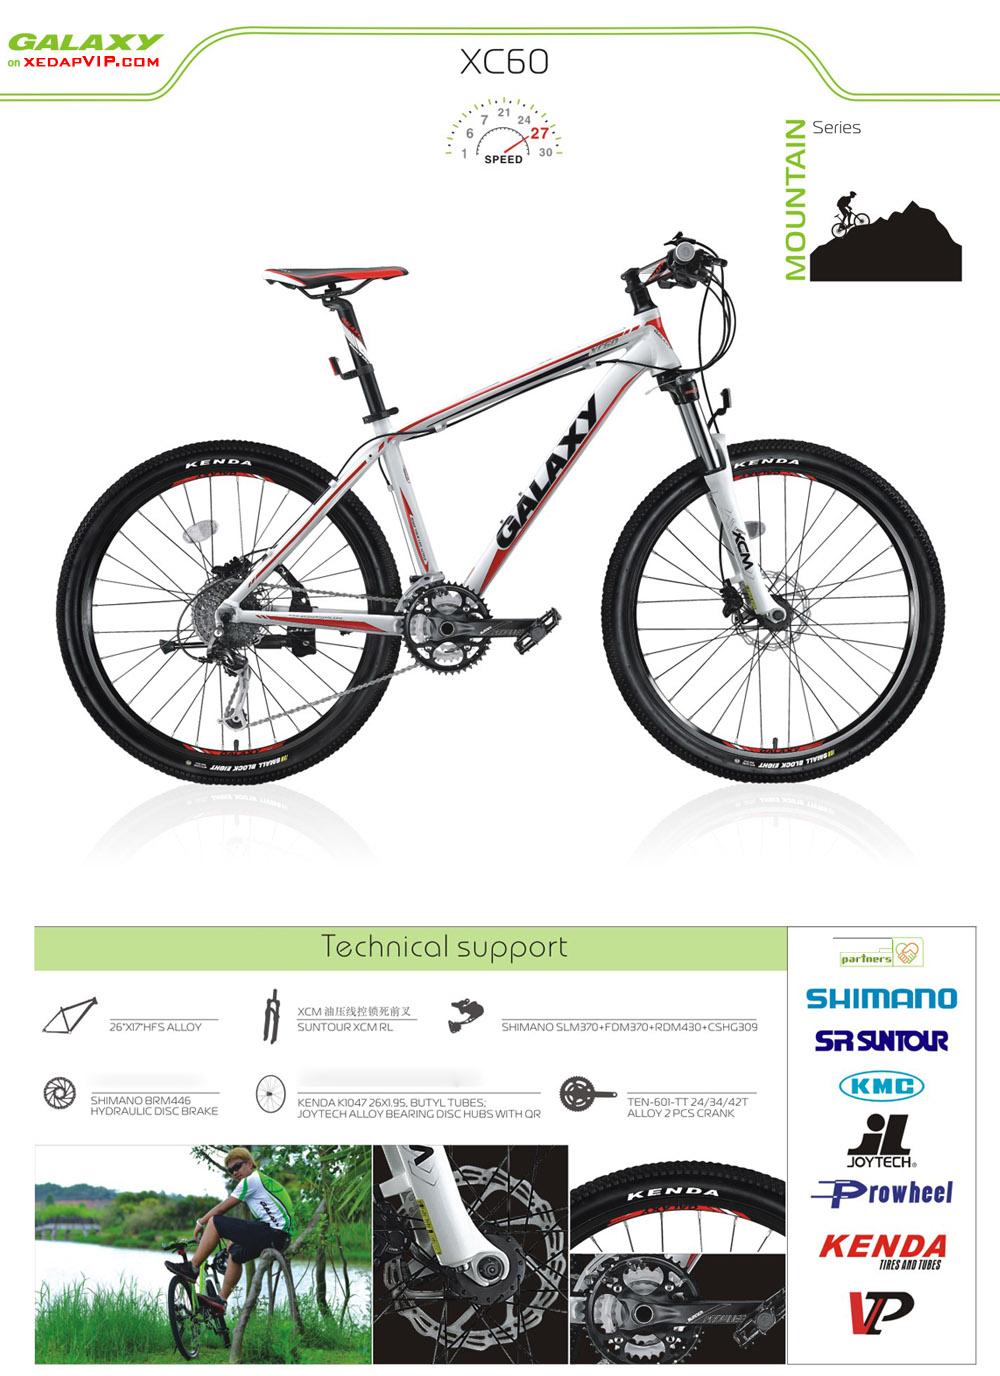 Xe dap the thao GALAXY XC60, xe dap the thao, xe dap trinx, xe đạp thể thao chính hãng, xe dap asama, xc60